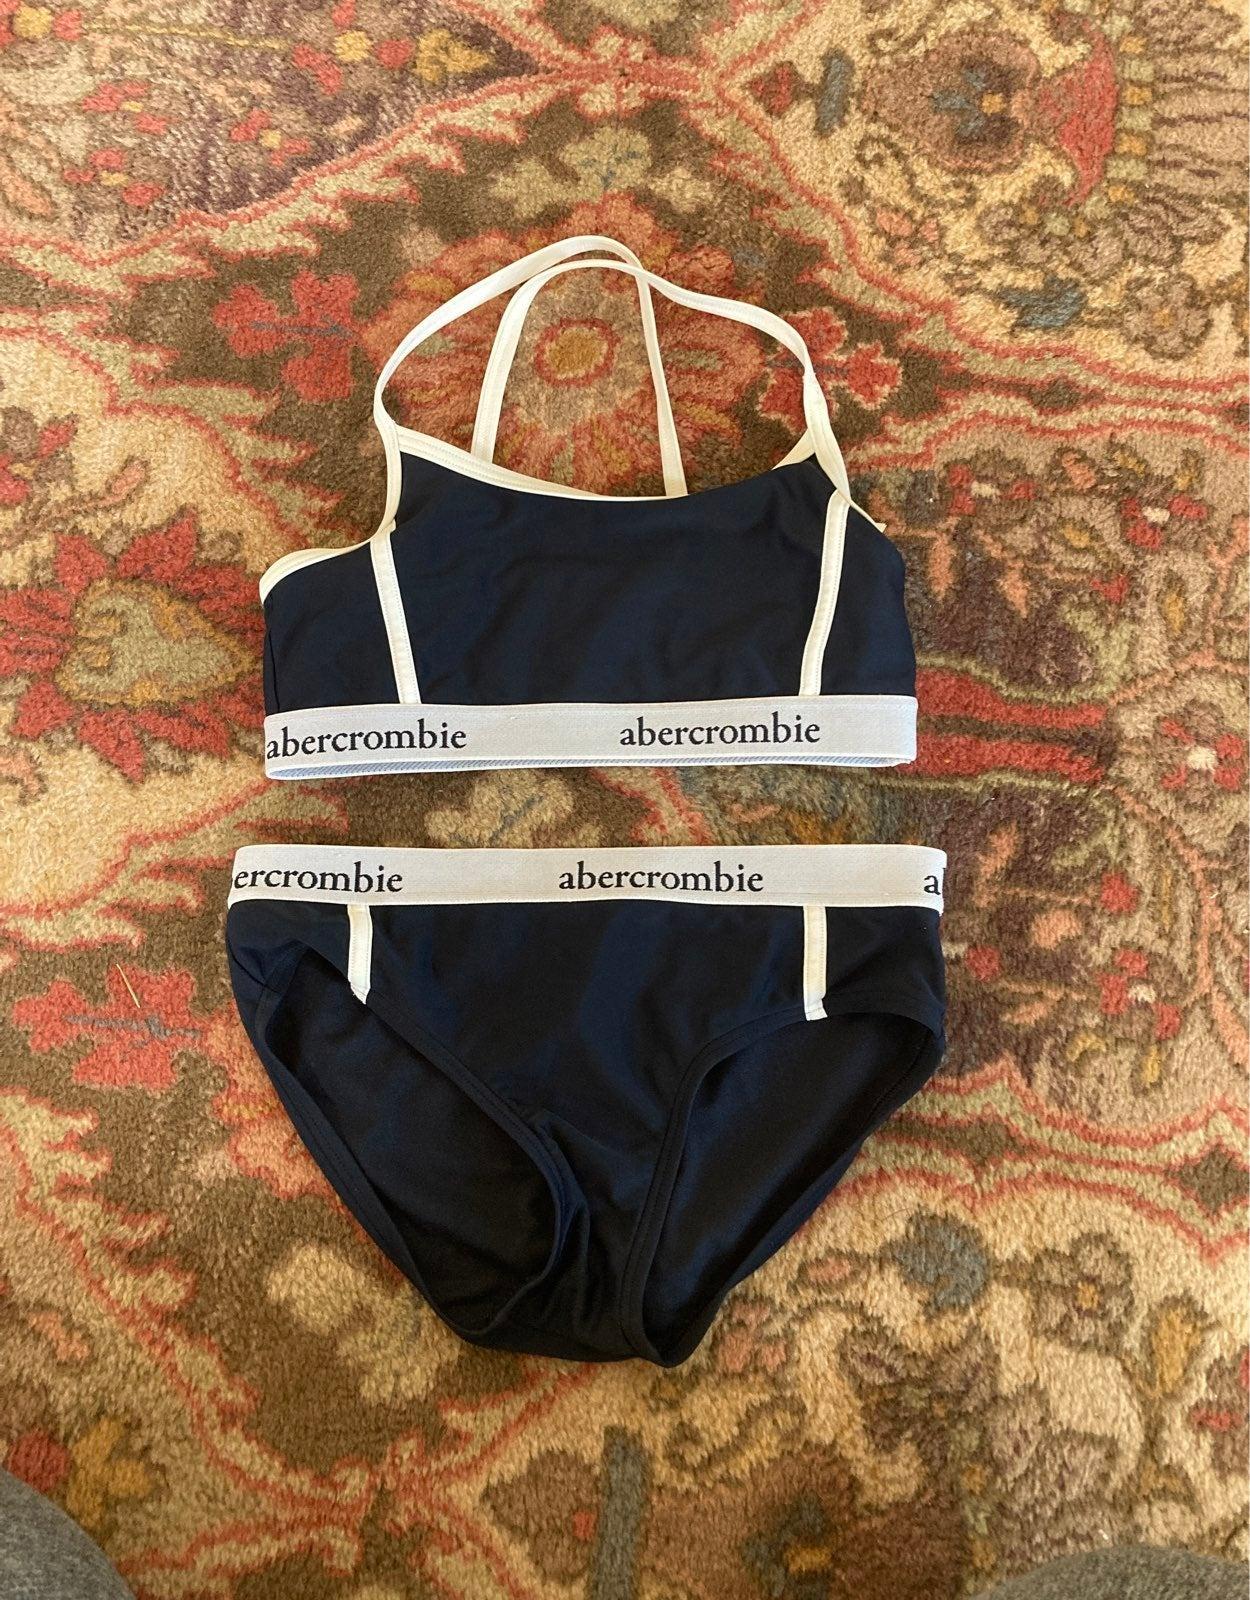 abercrombie kids girl's bathing suit